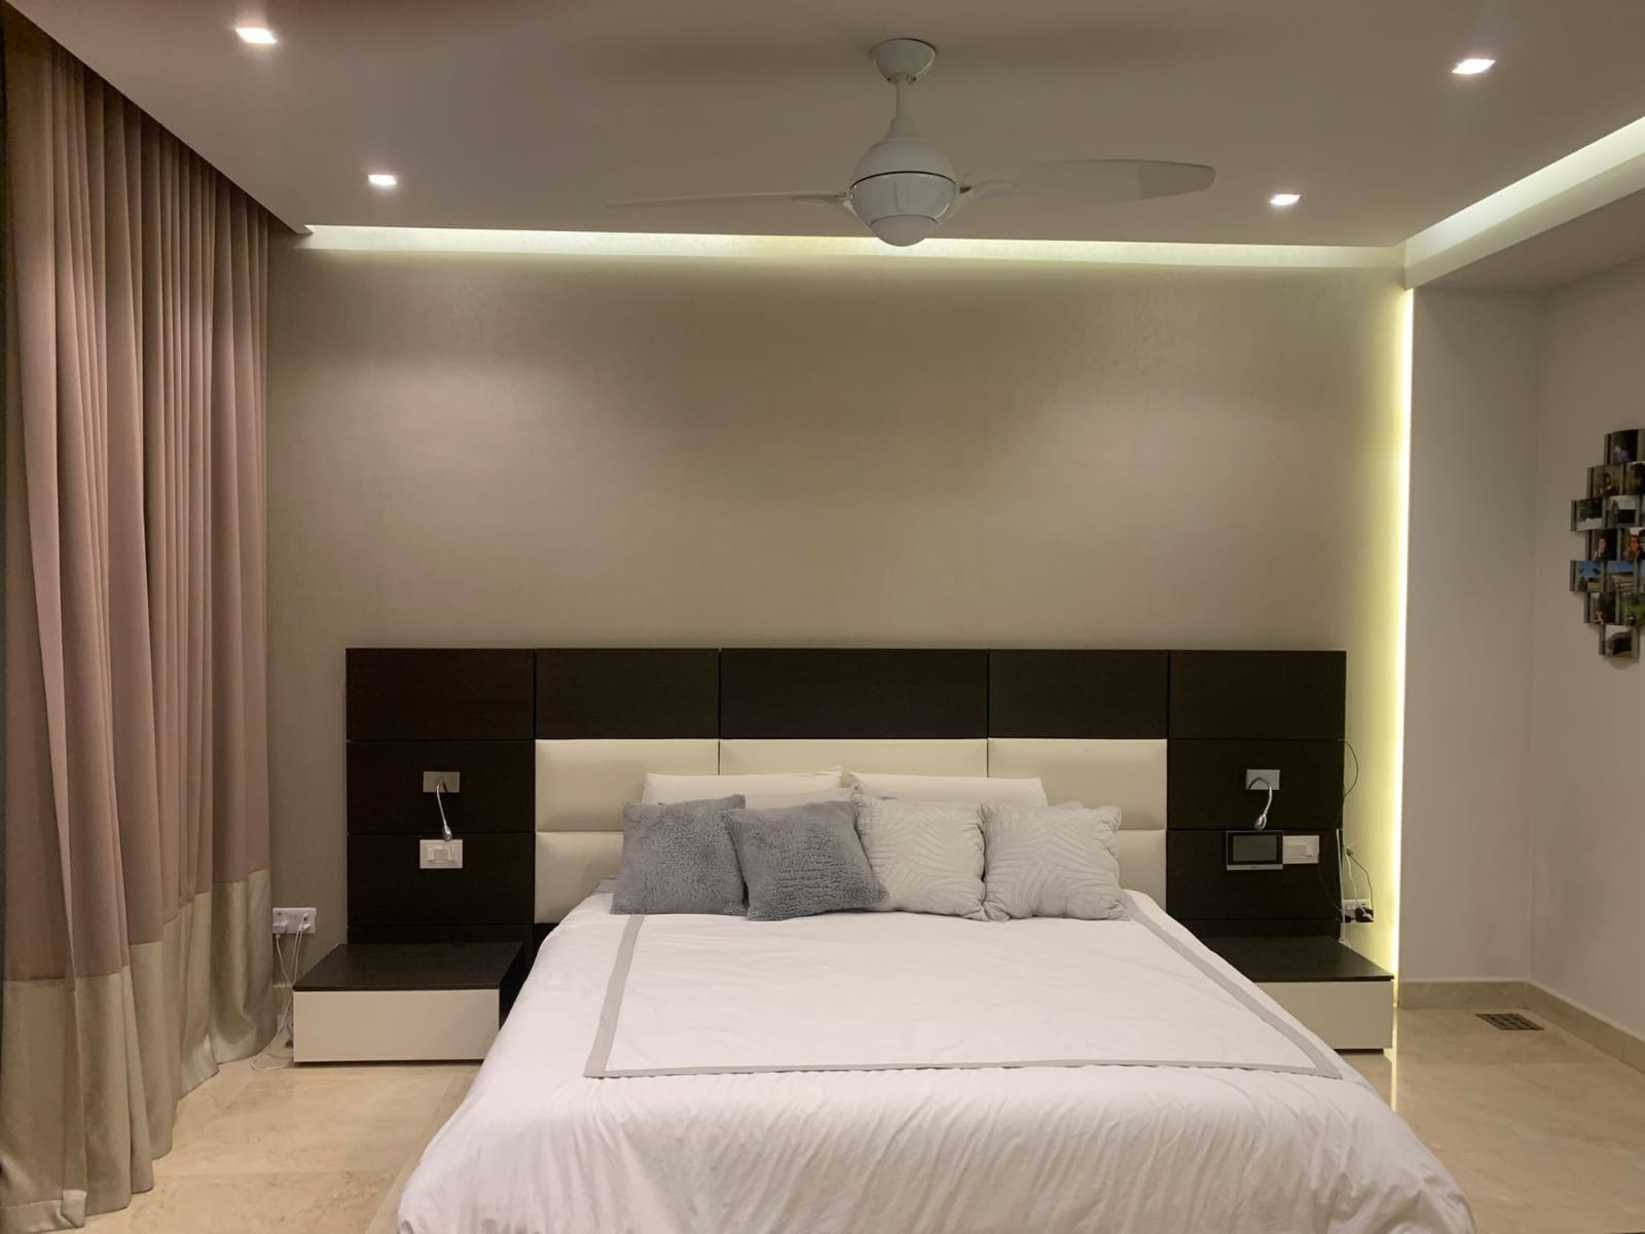 4 bed Villa For Rent in Ibragg, Ibragg - thumb 8